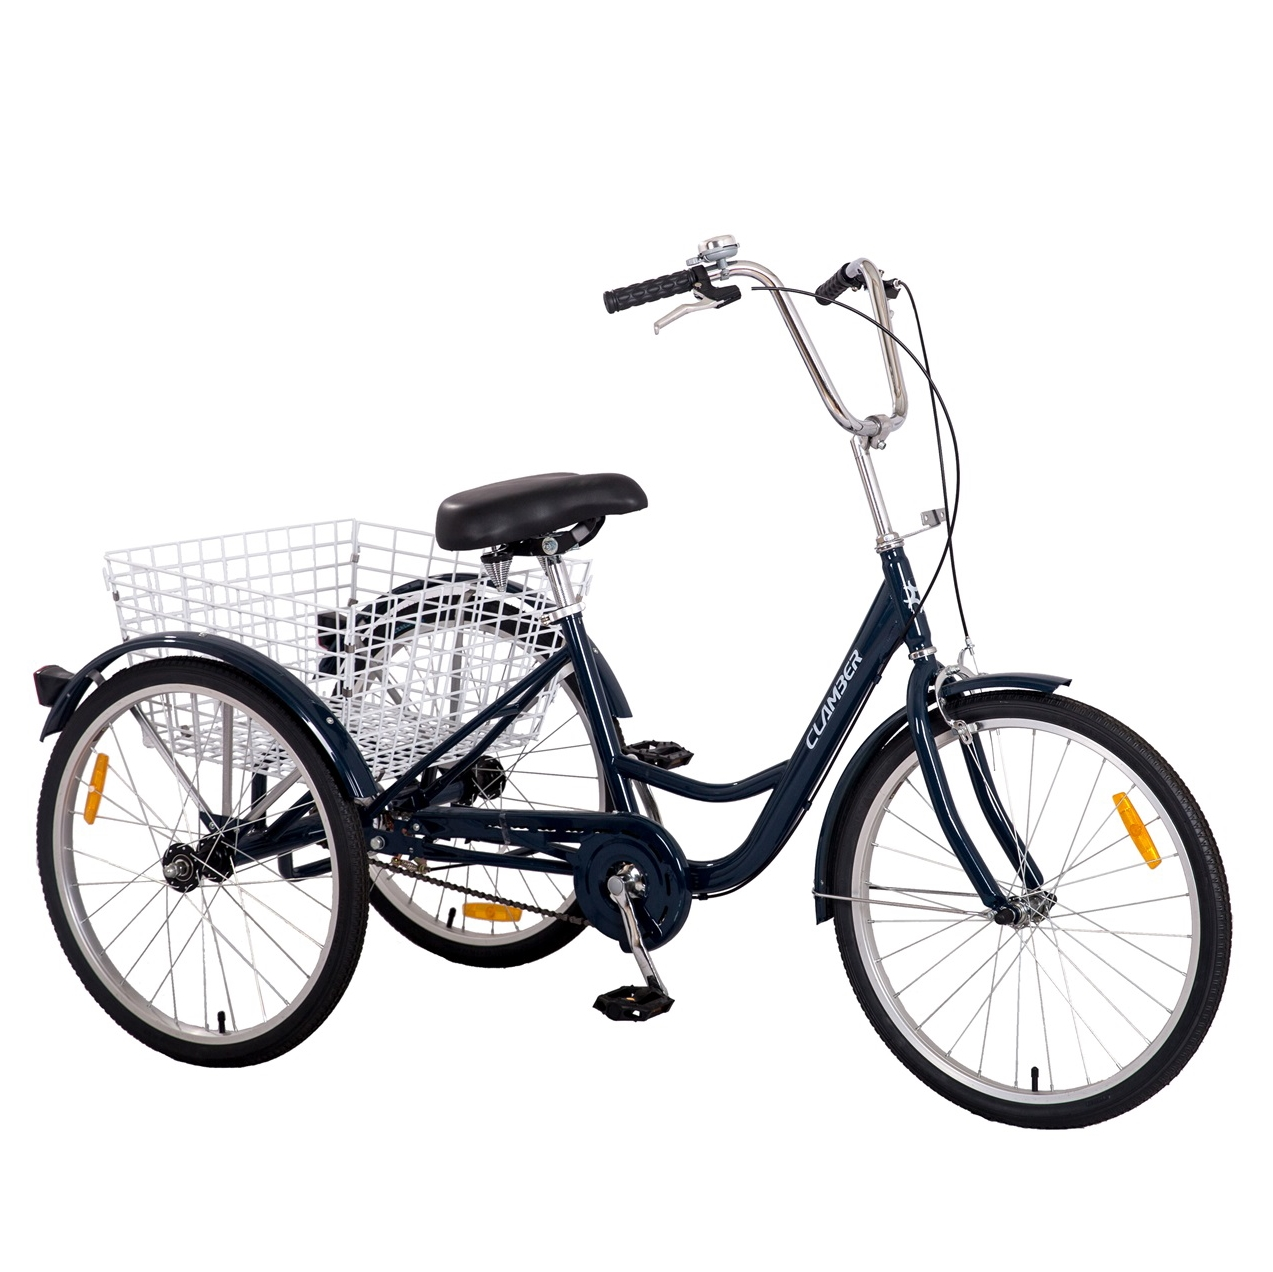 2021 adult trike tricycle 3 wheels with basket